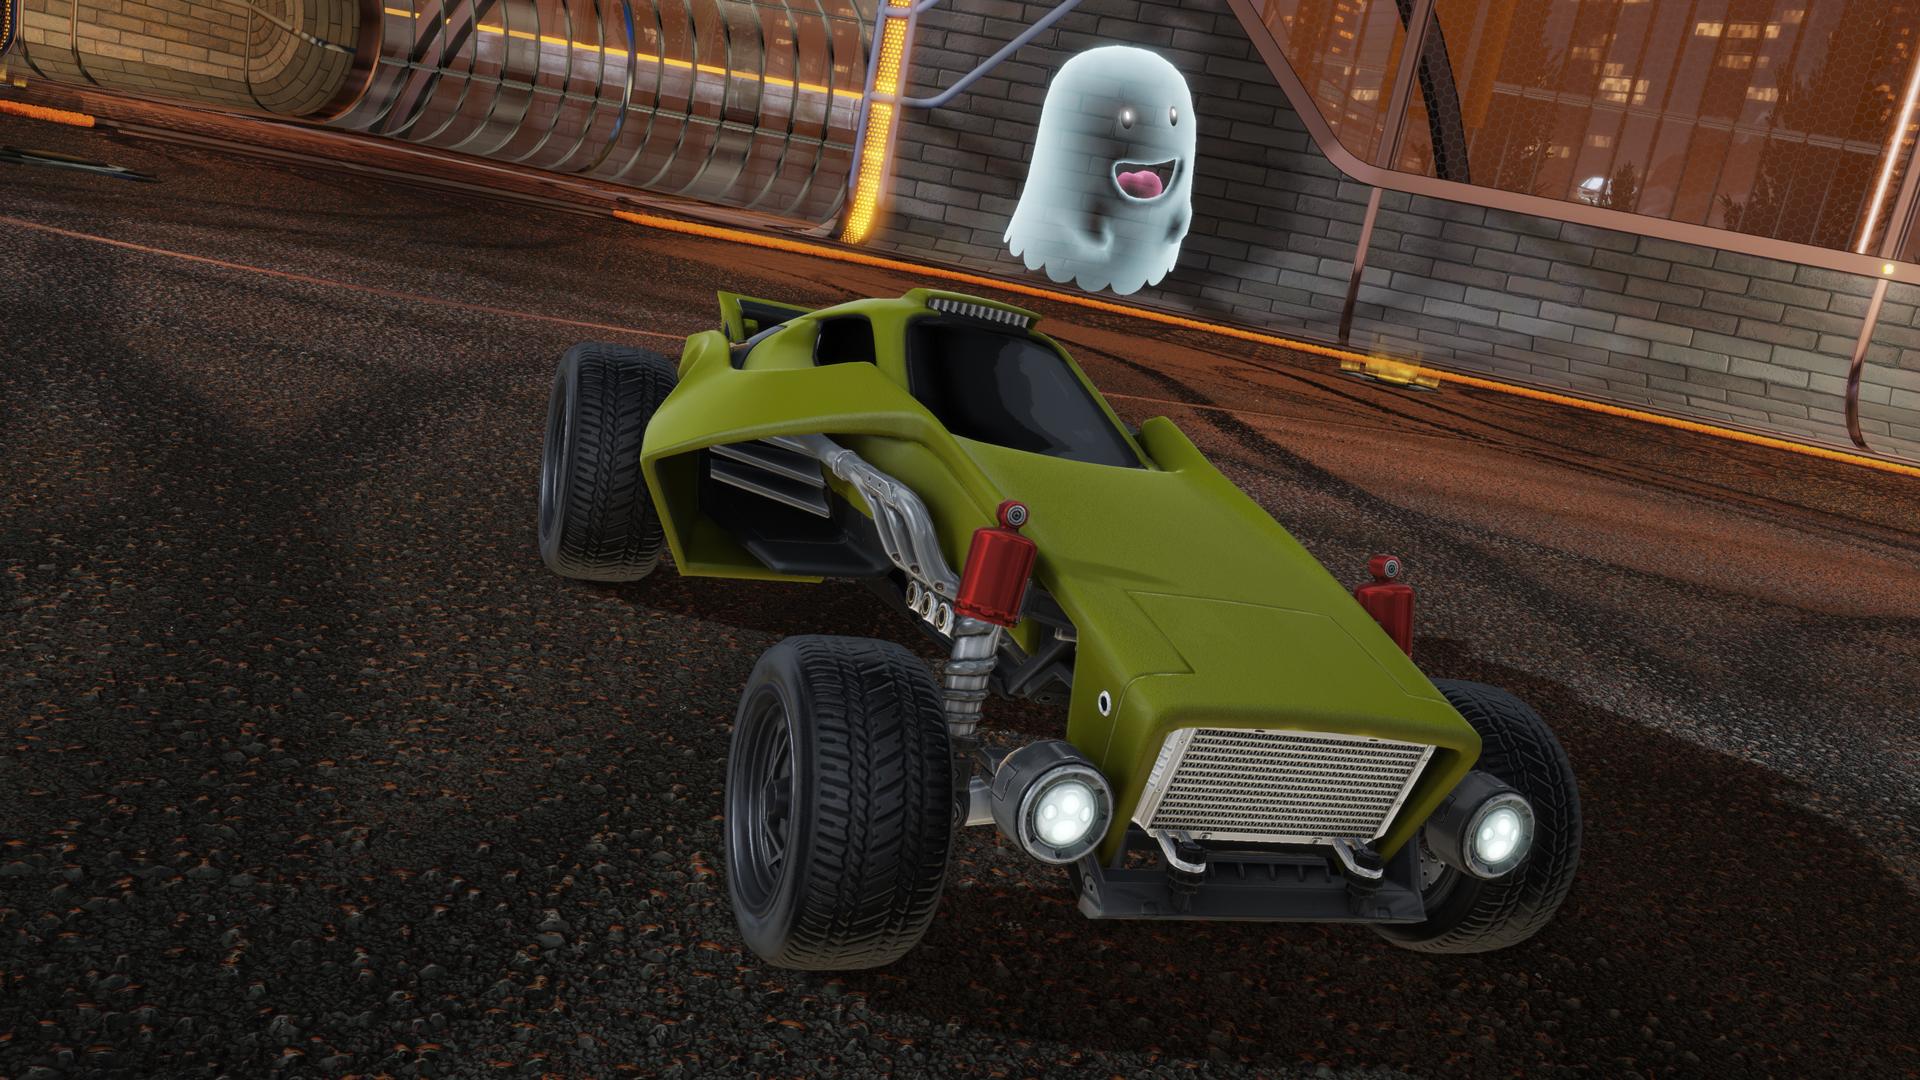 rocket_league-3536824